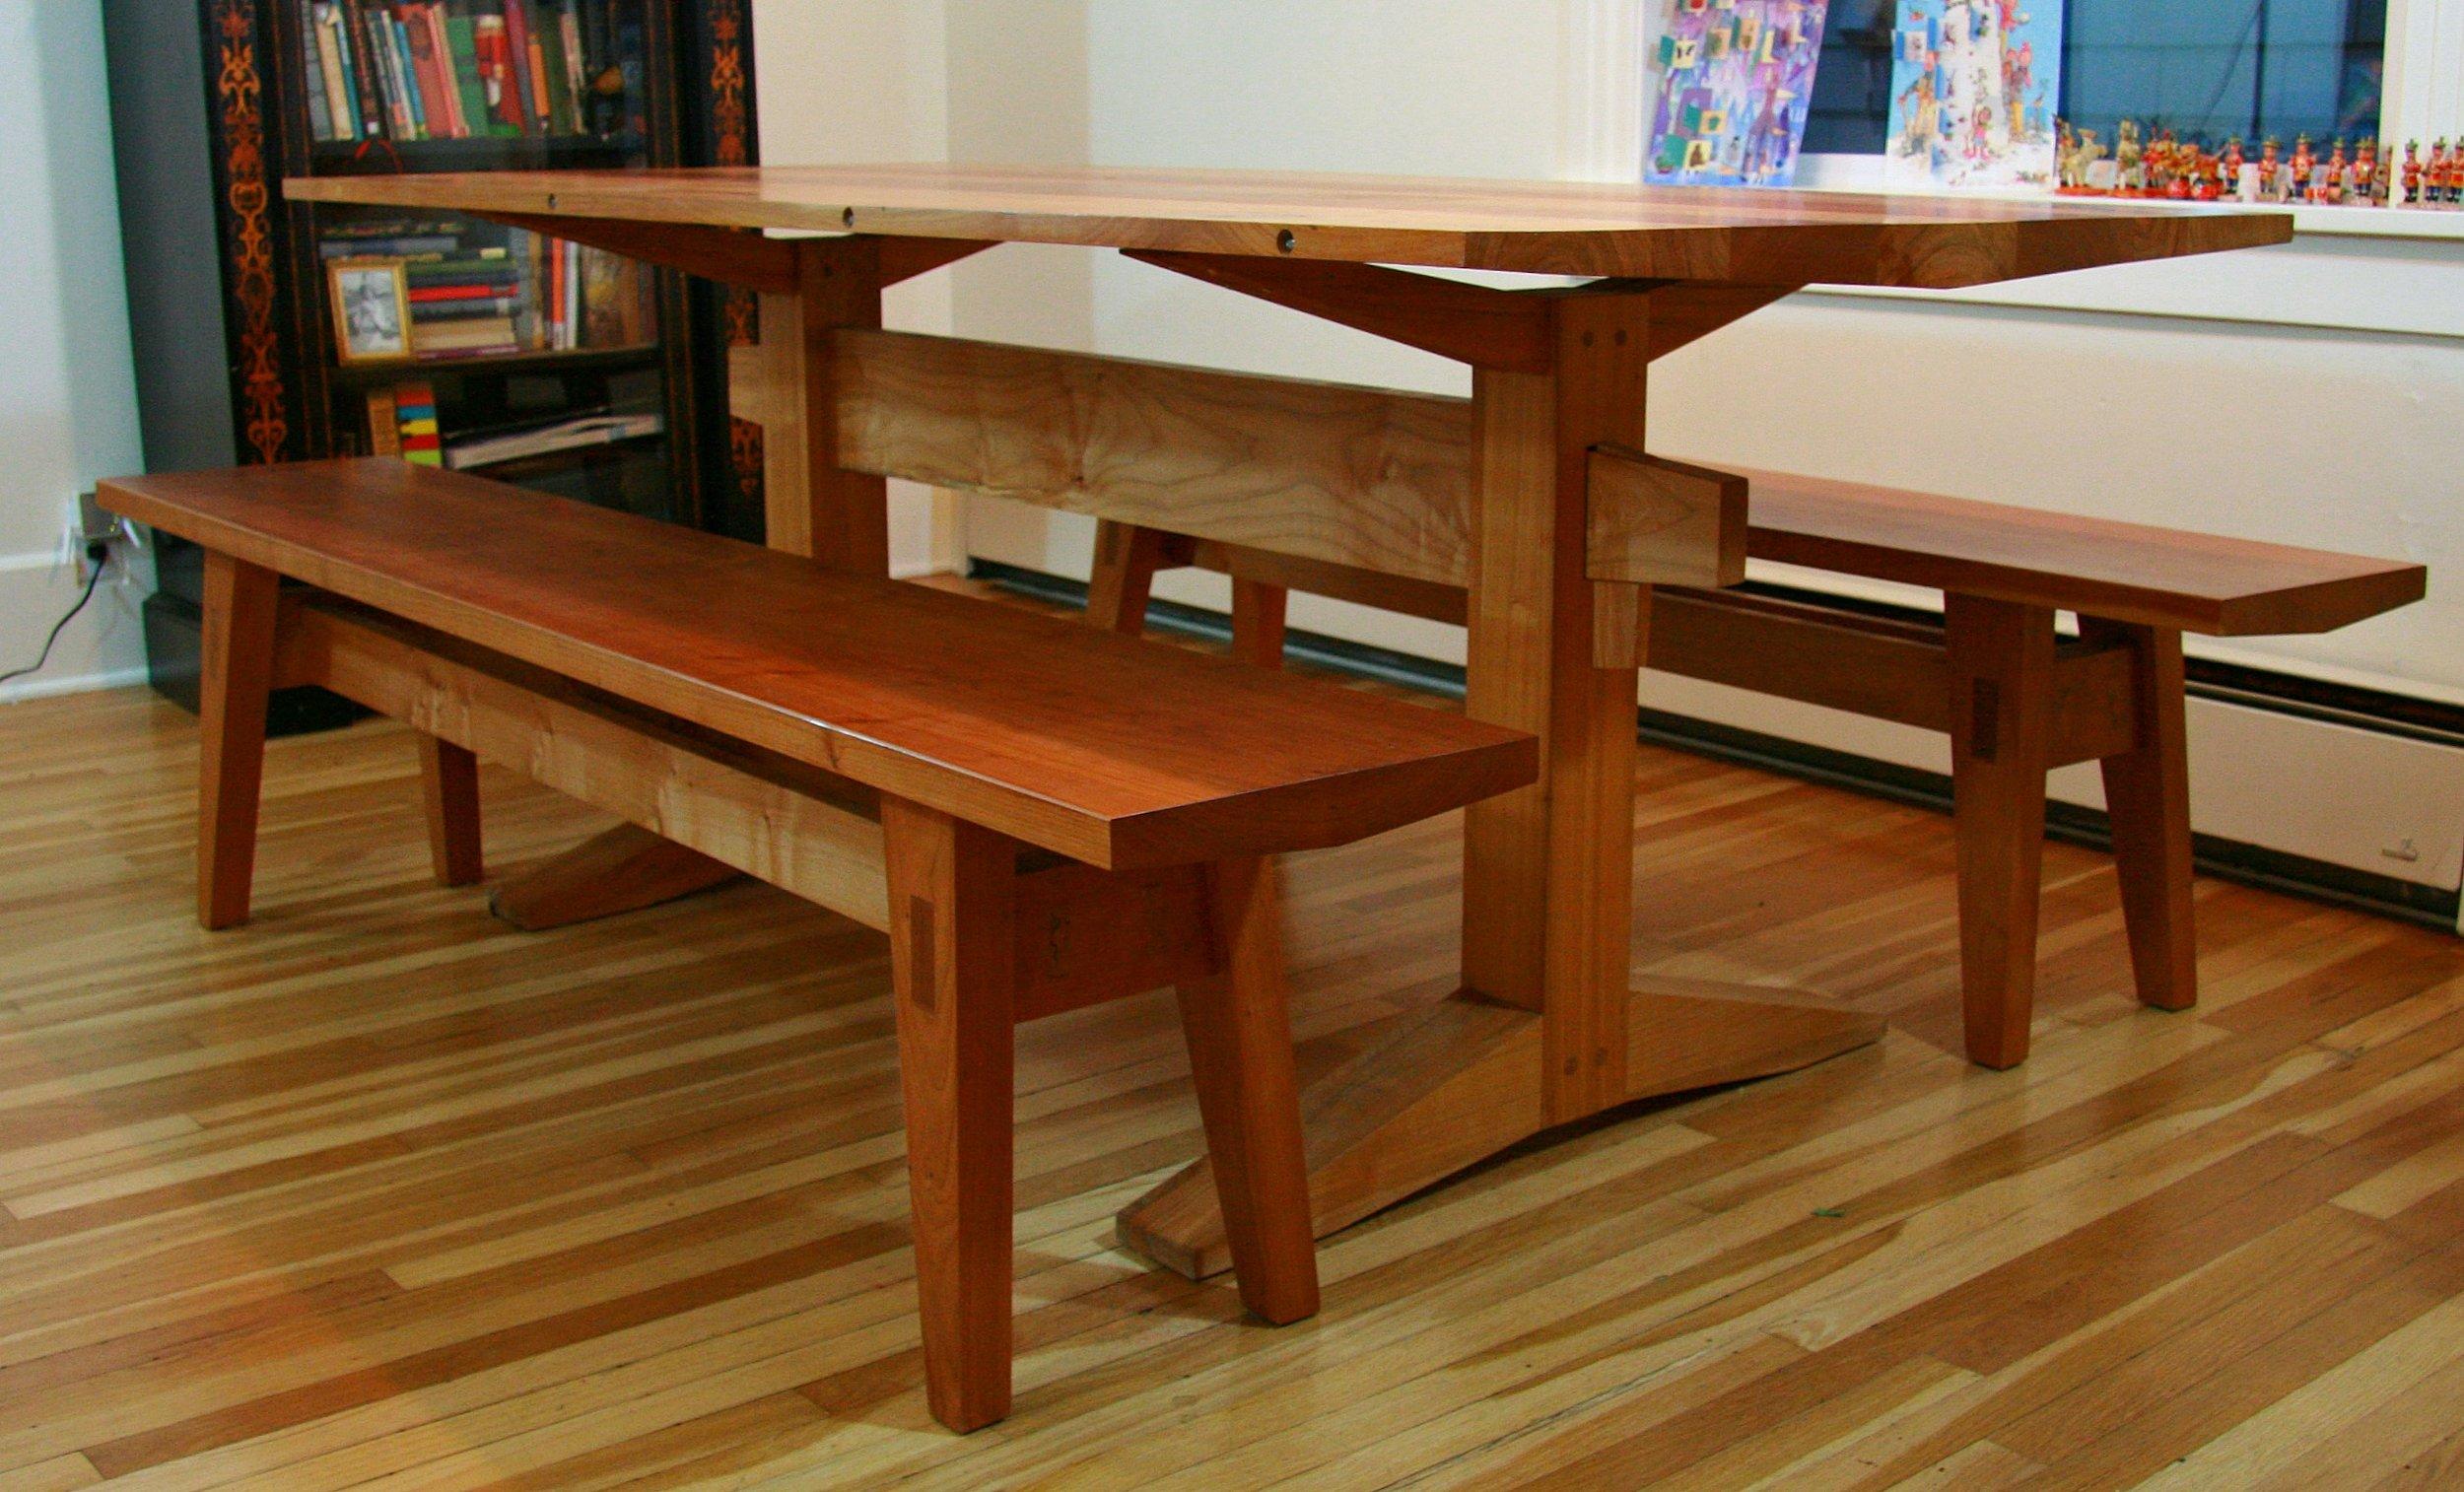 cherry-trestle-table_23407382463_o.jpg